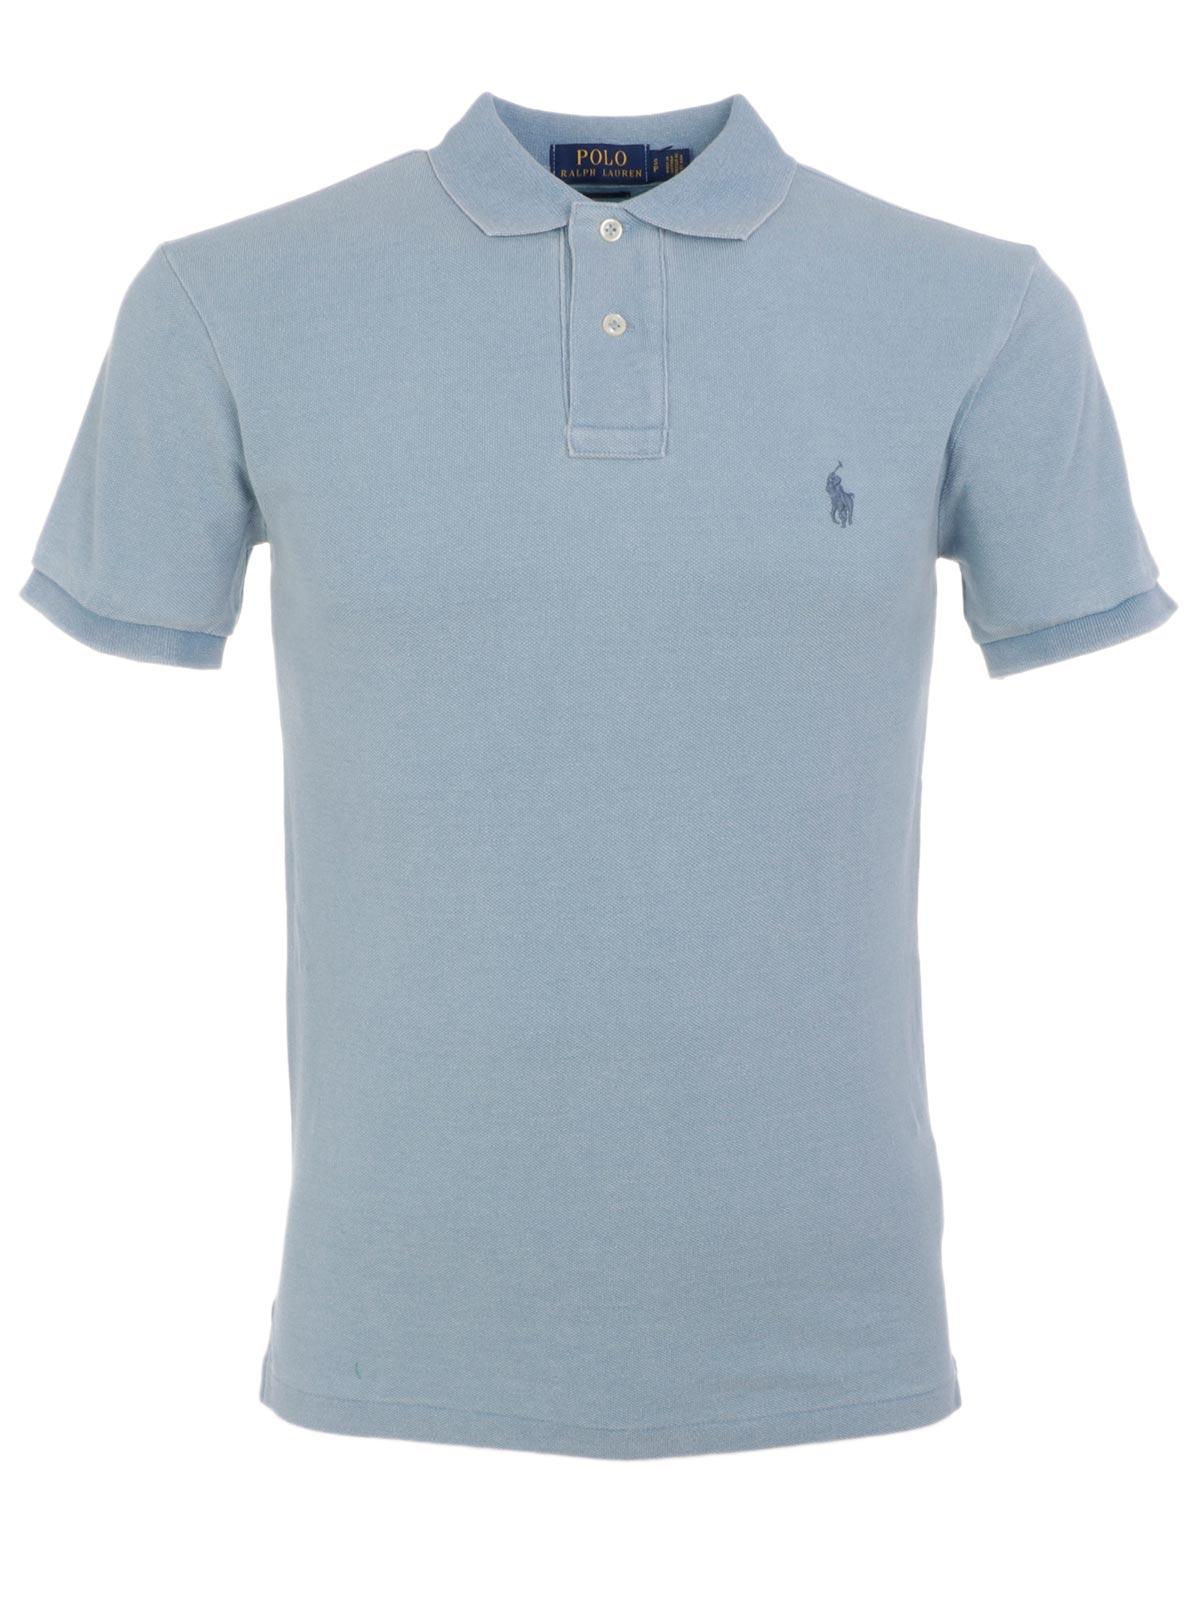 Picture of POLO RALPH LAUREN | Men's Cotton Polo Shirt